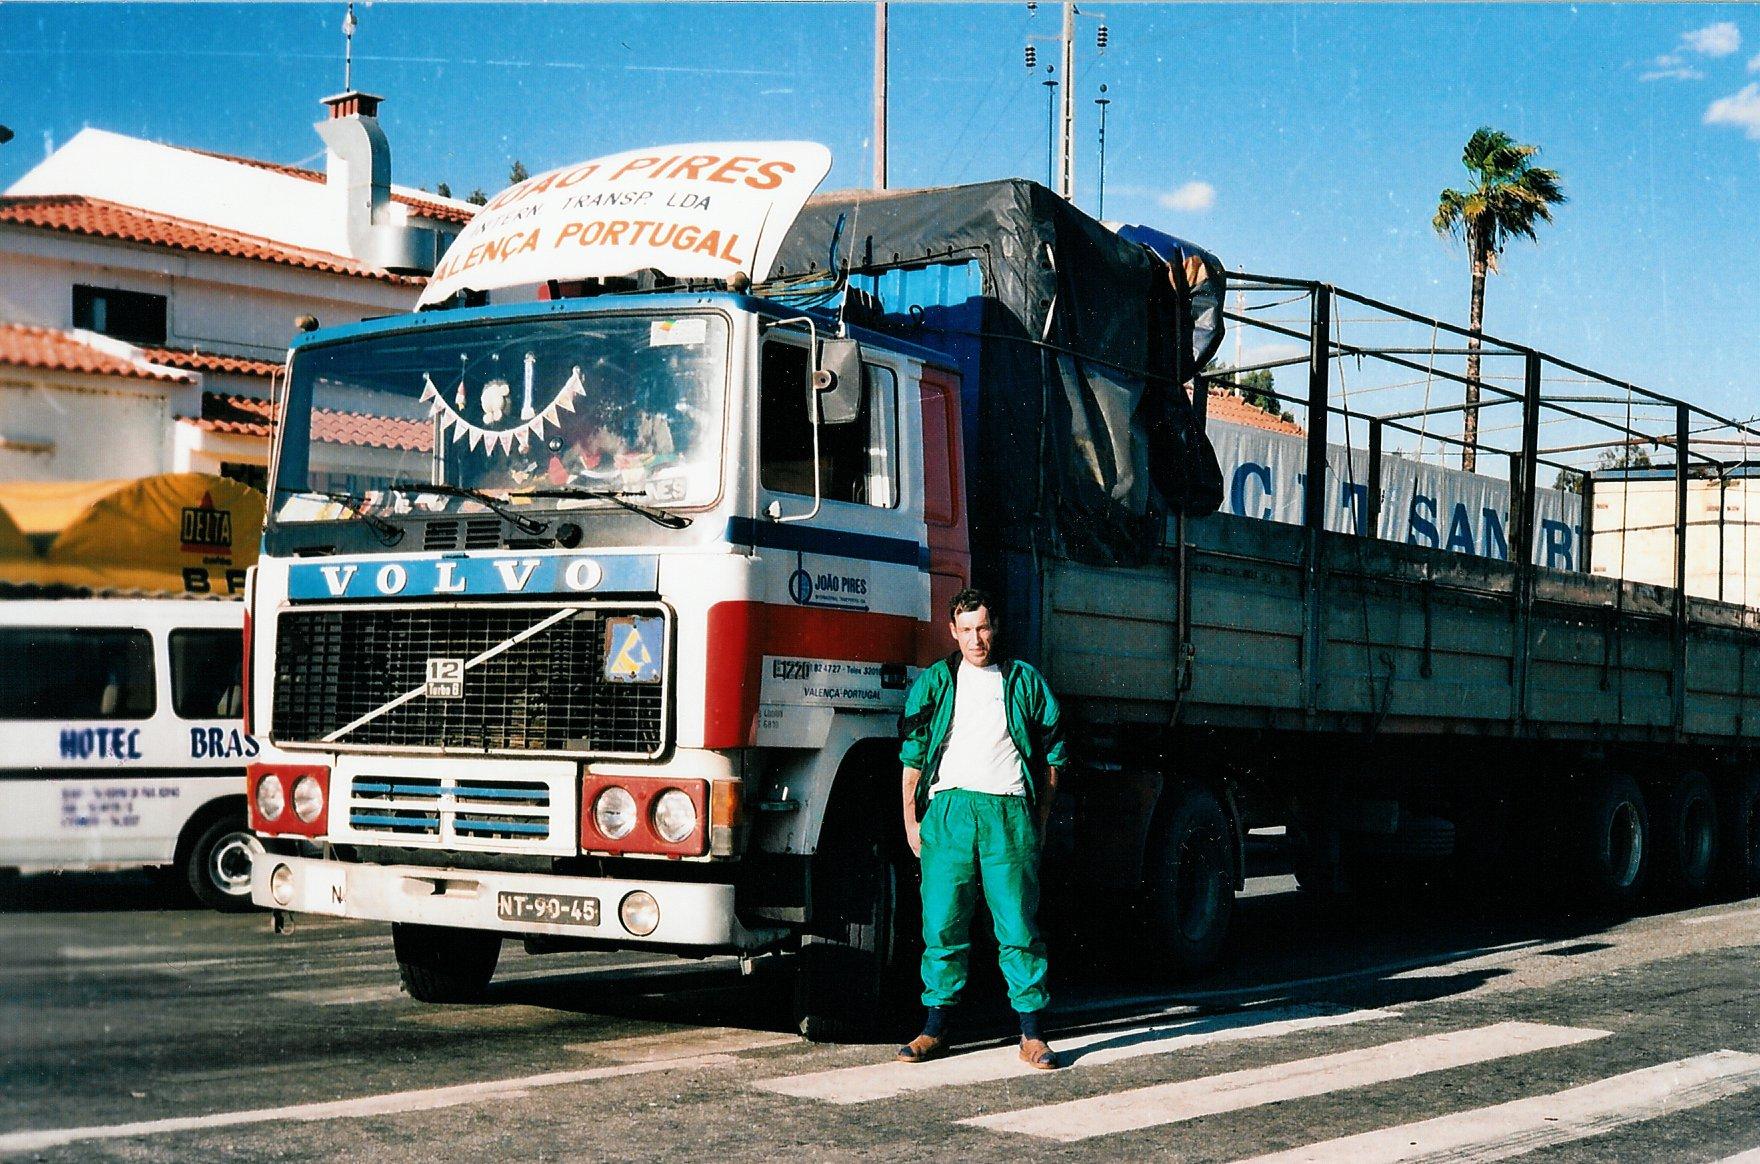 Volvo--Restaurante-Brasa-Caia